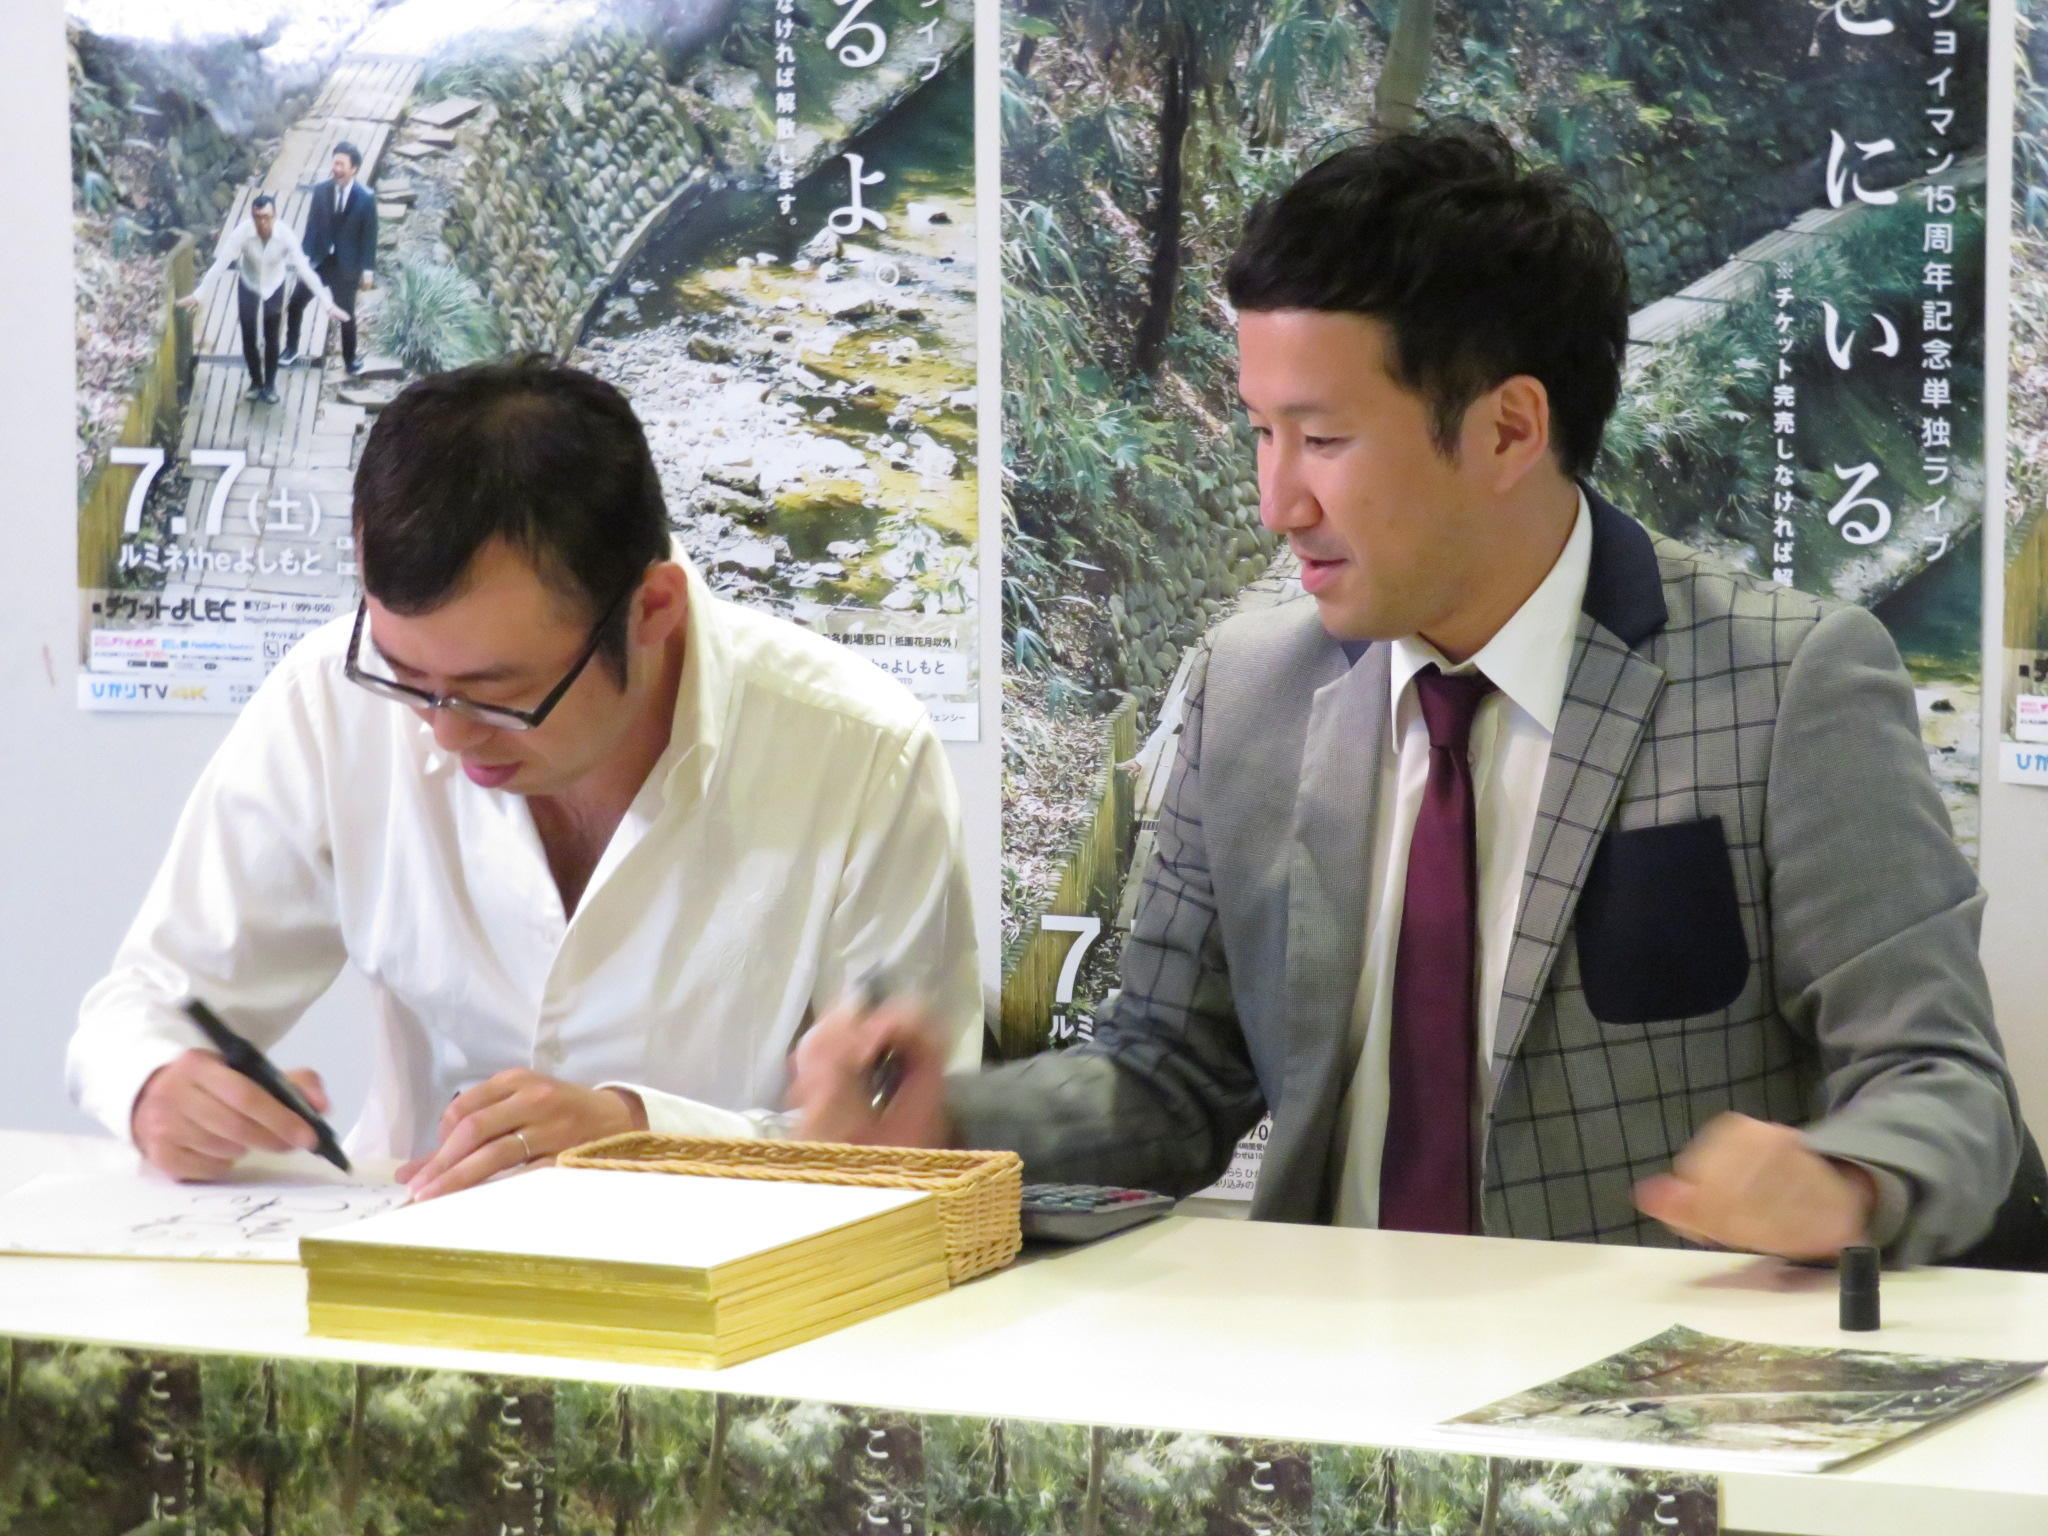 http://news.yoshimoto.co.jp/20180515003839-f20bafc071c4c353eebd1b6e70c8505b56eaa762.jpg